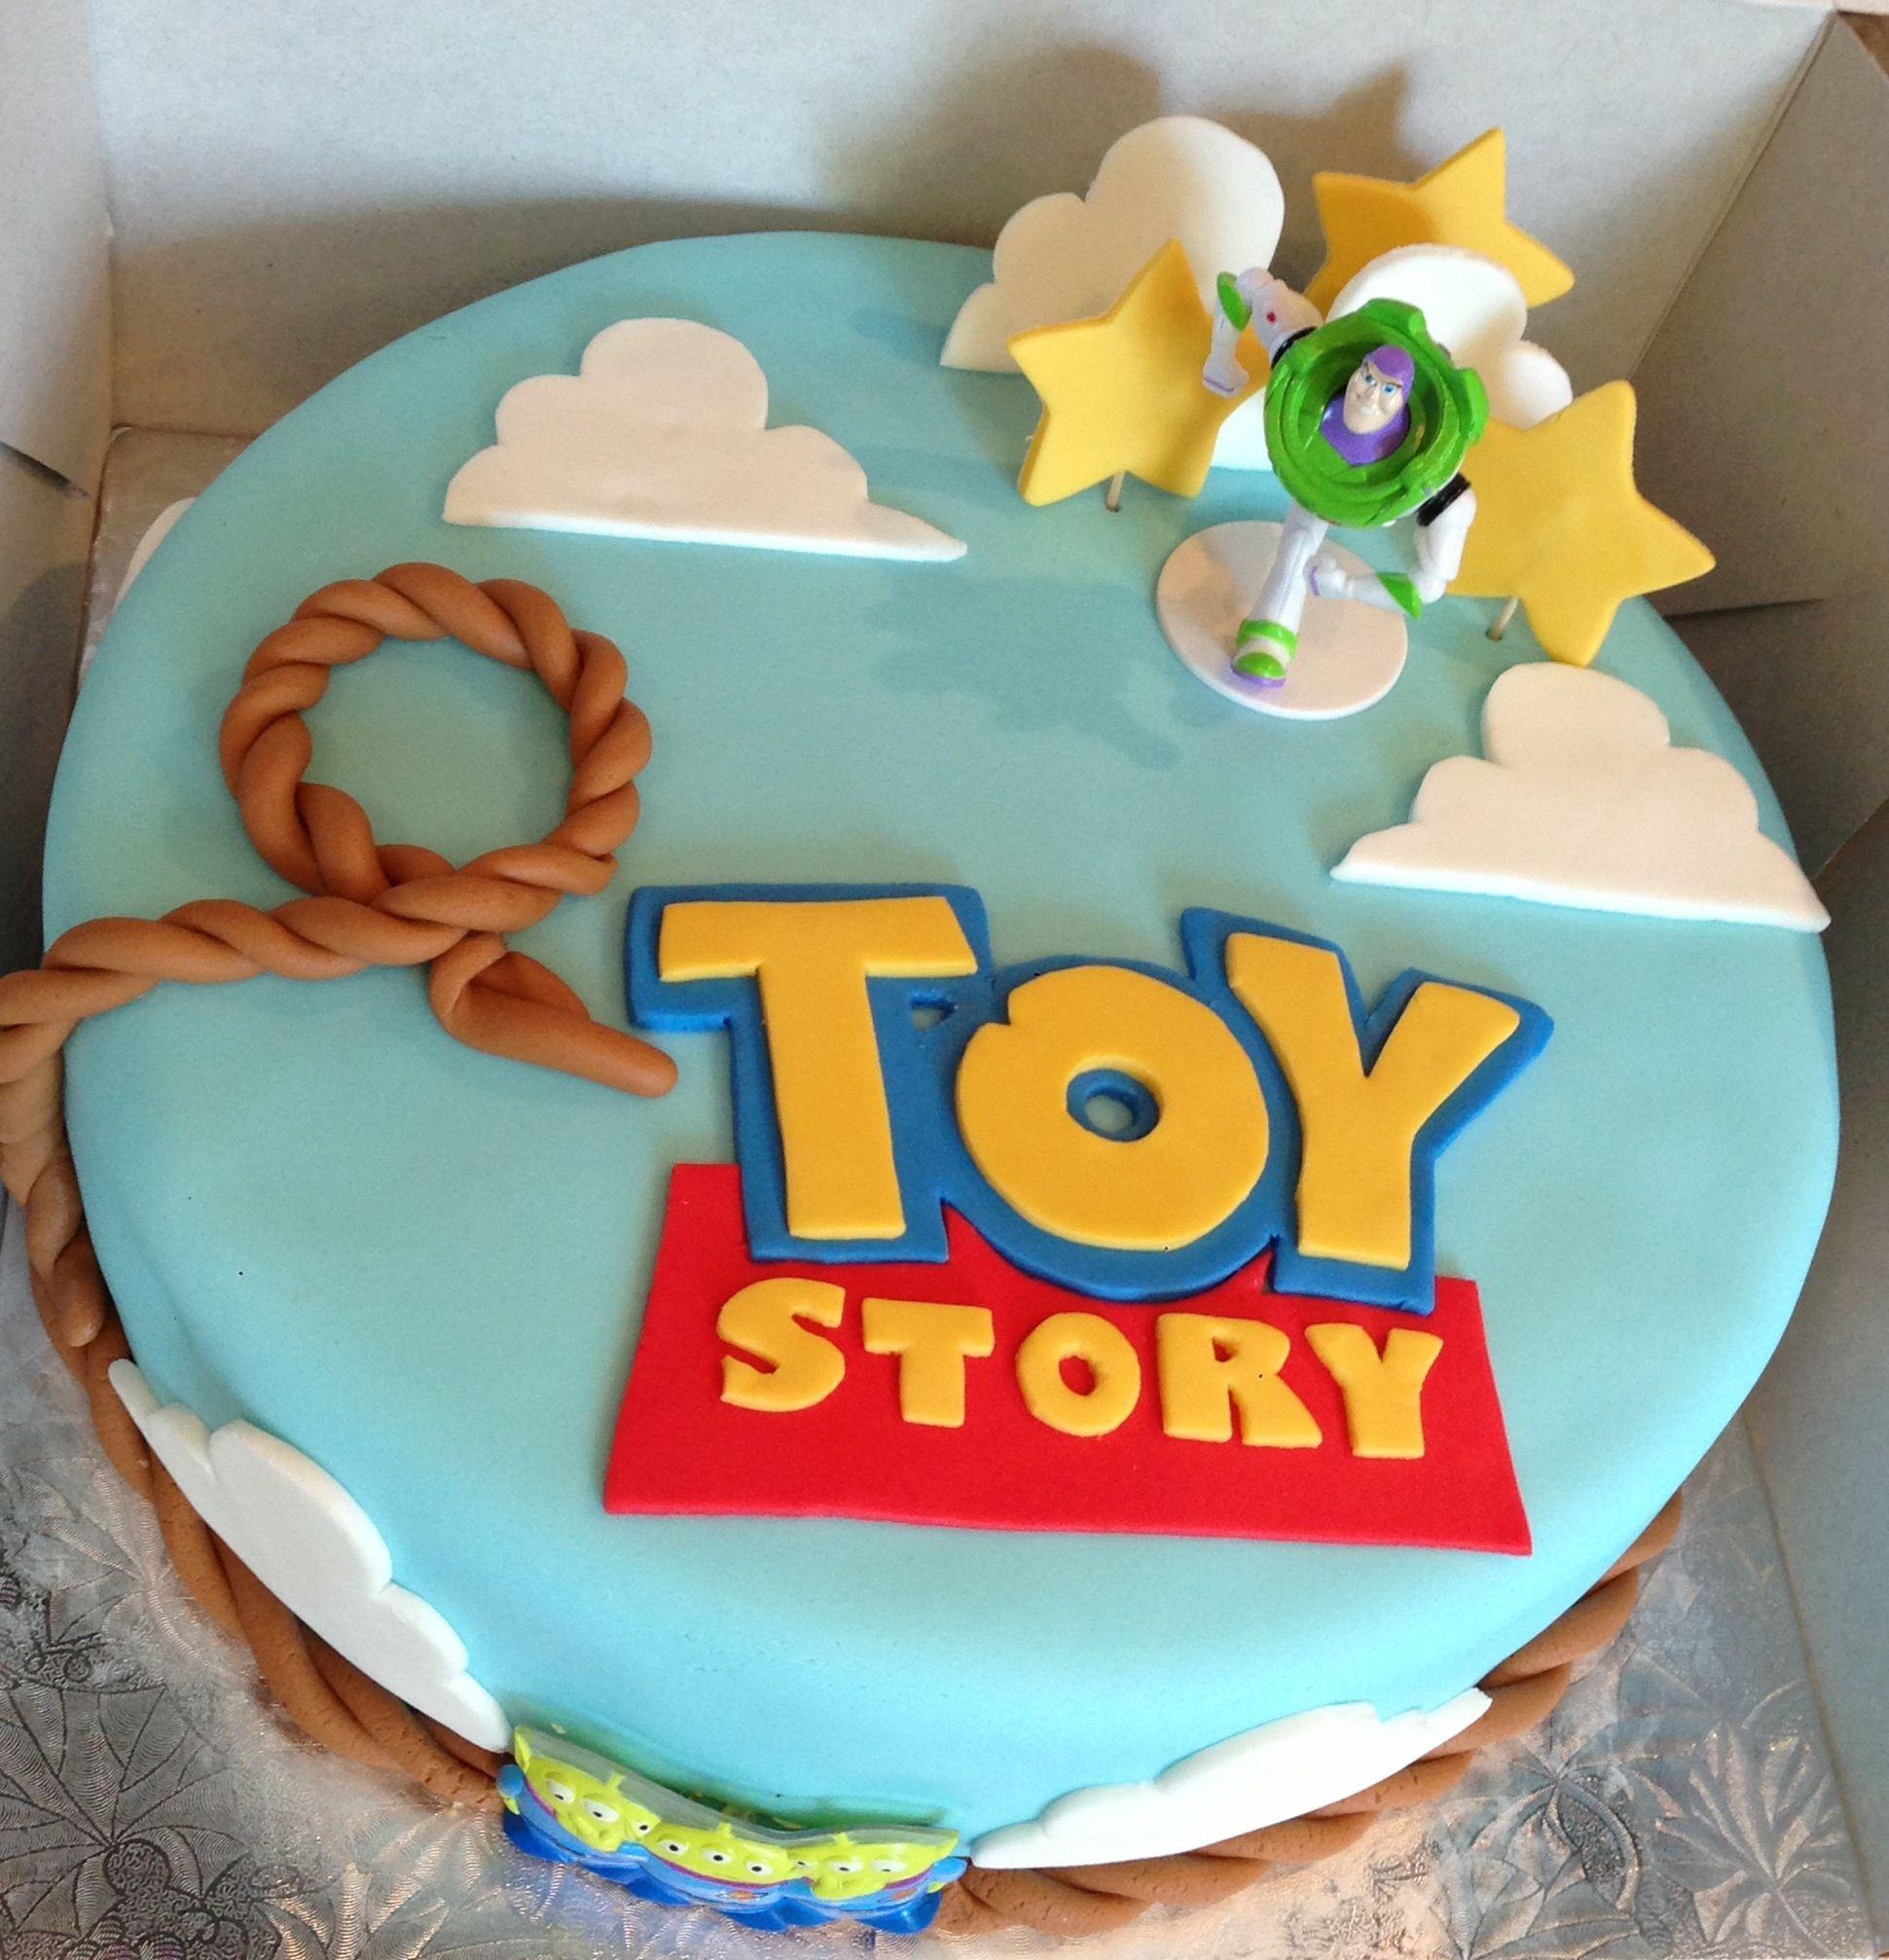 Paul Layer Cake